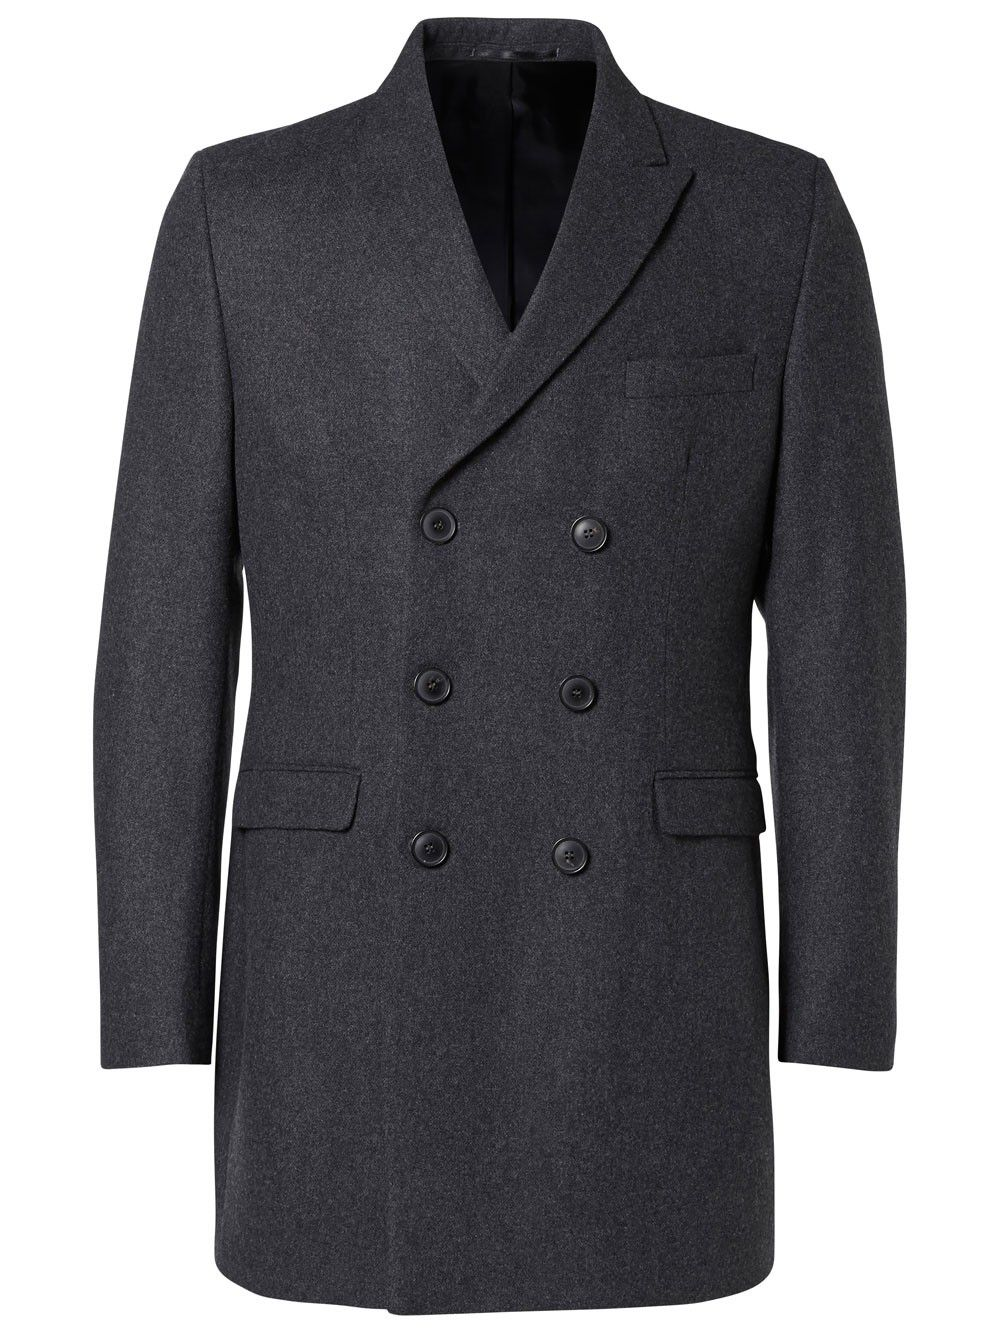 manteau selected mod le sharp gris kebello com. Black Bedroom Furniture Sets. Home Design Ideas